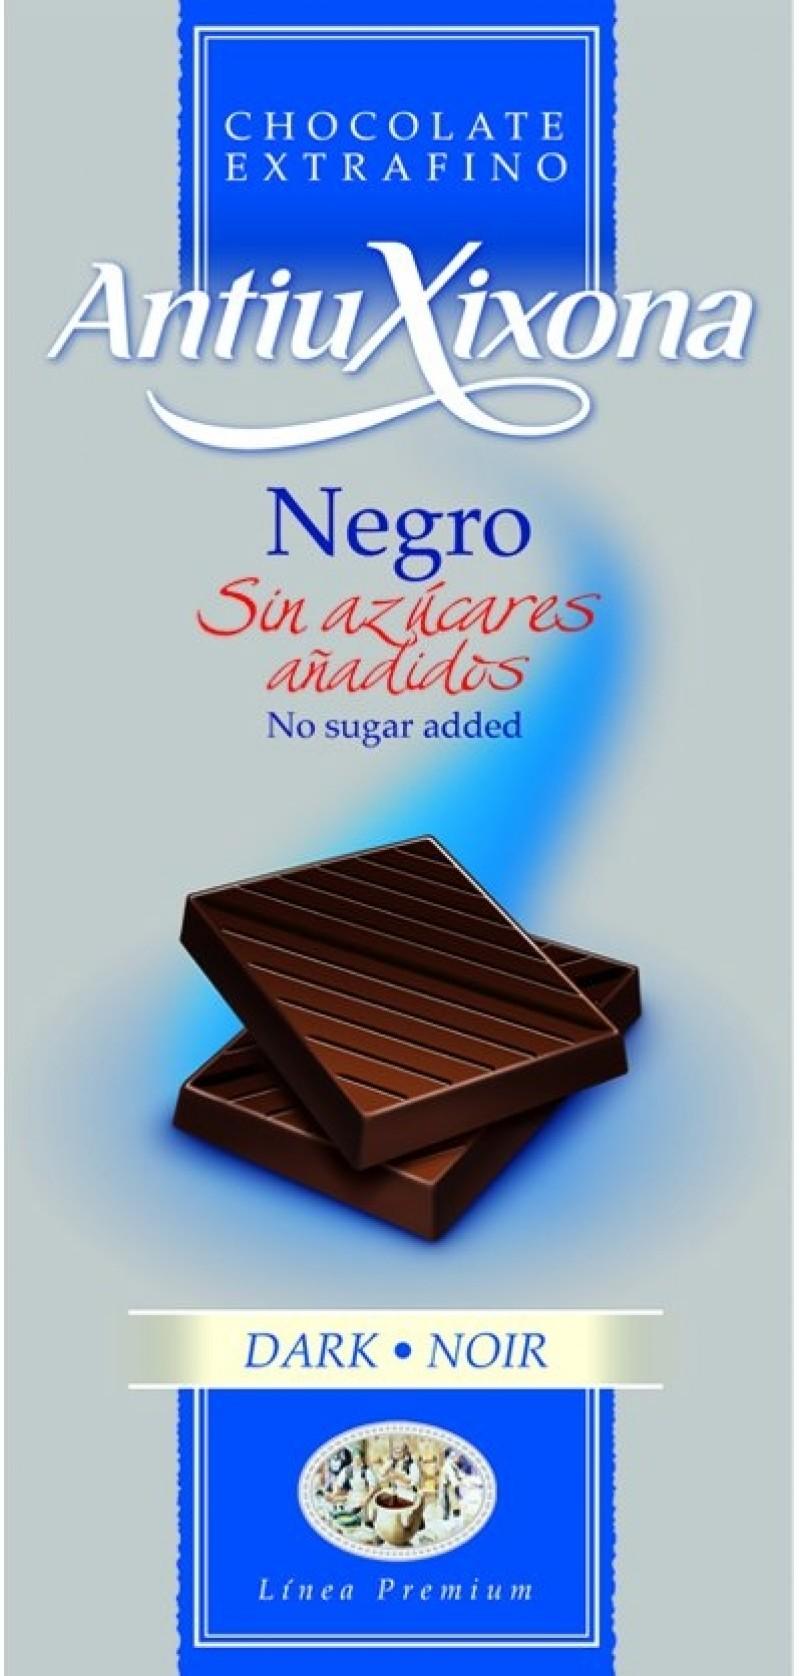 chocolate-negro-sin-azucares-anadidos-antiu-xixona